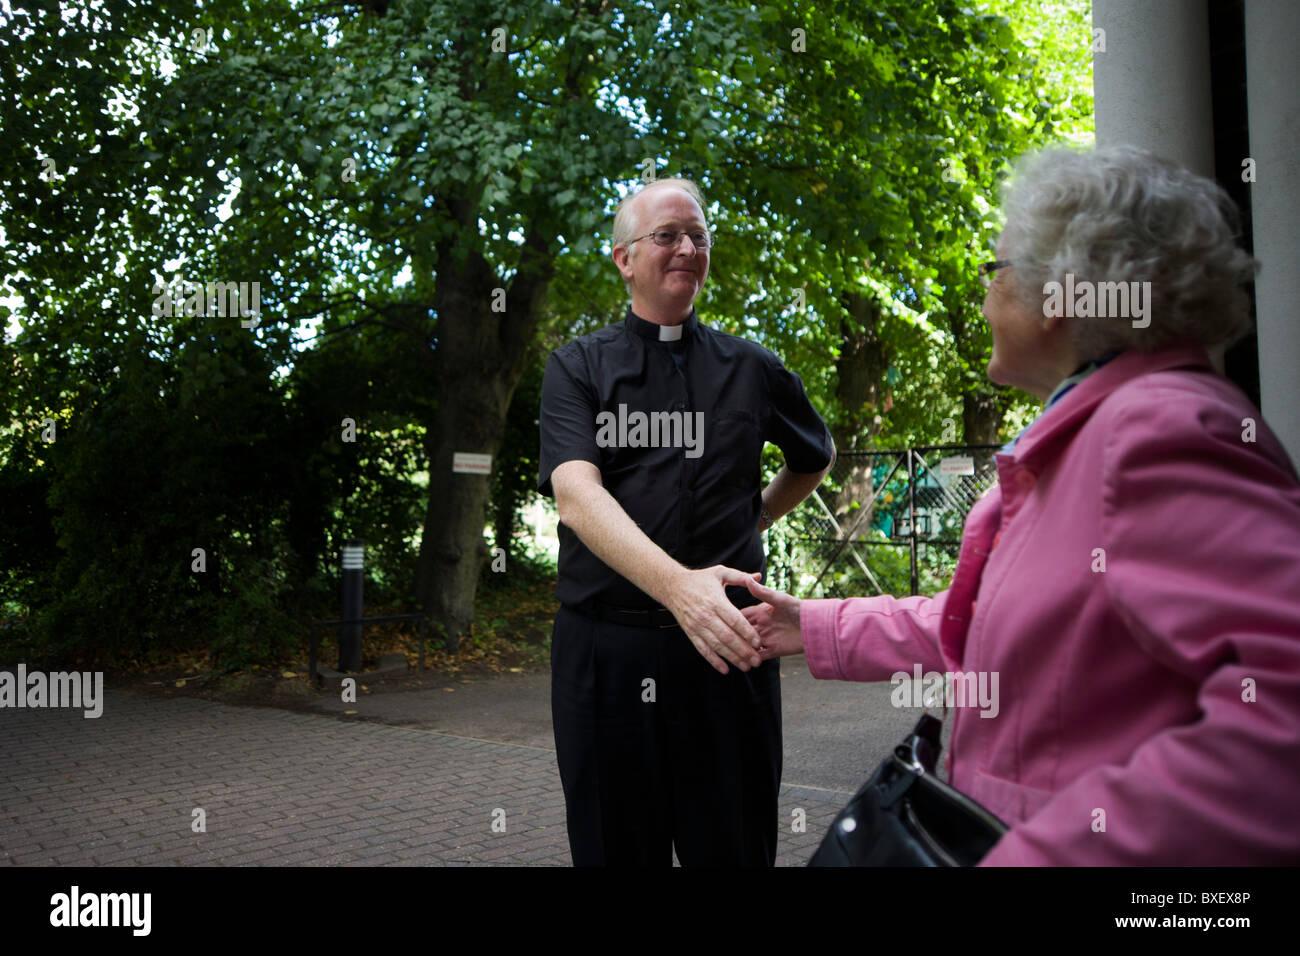 Catholic priest bids goodbye to parishioner after morning Mass at St. Lawrence's Catholic church in Feltham, - Stock Image